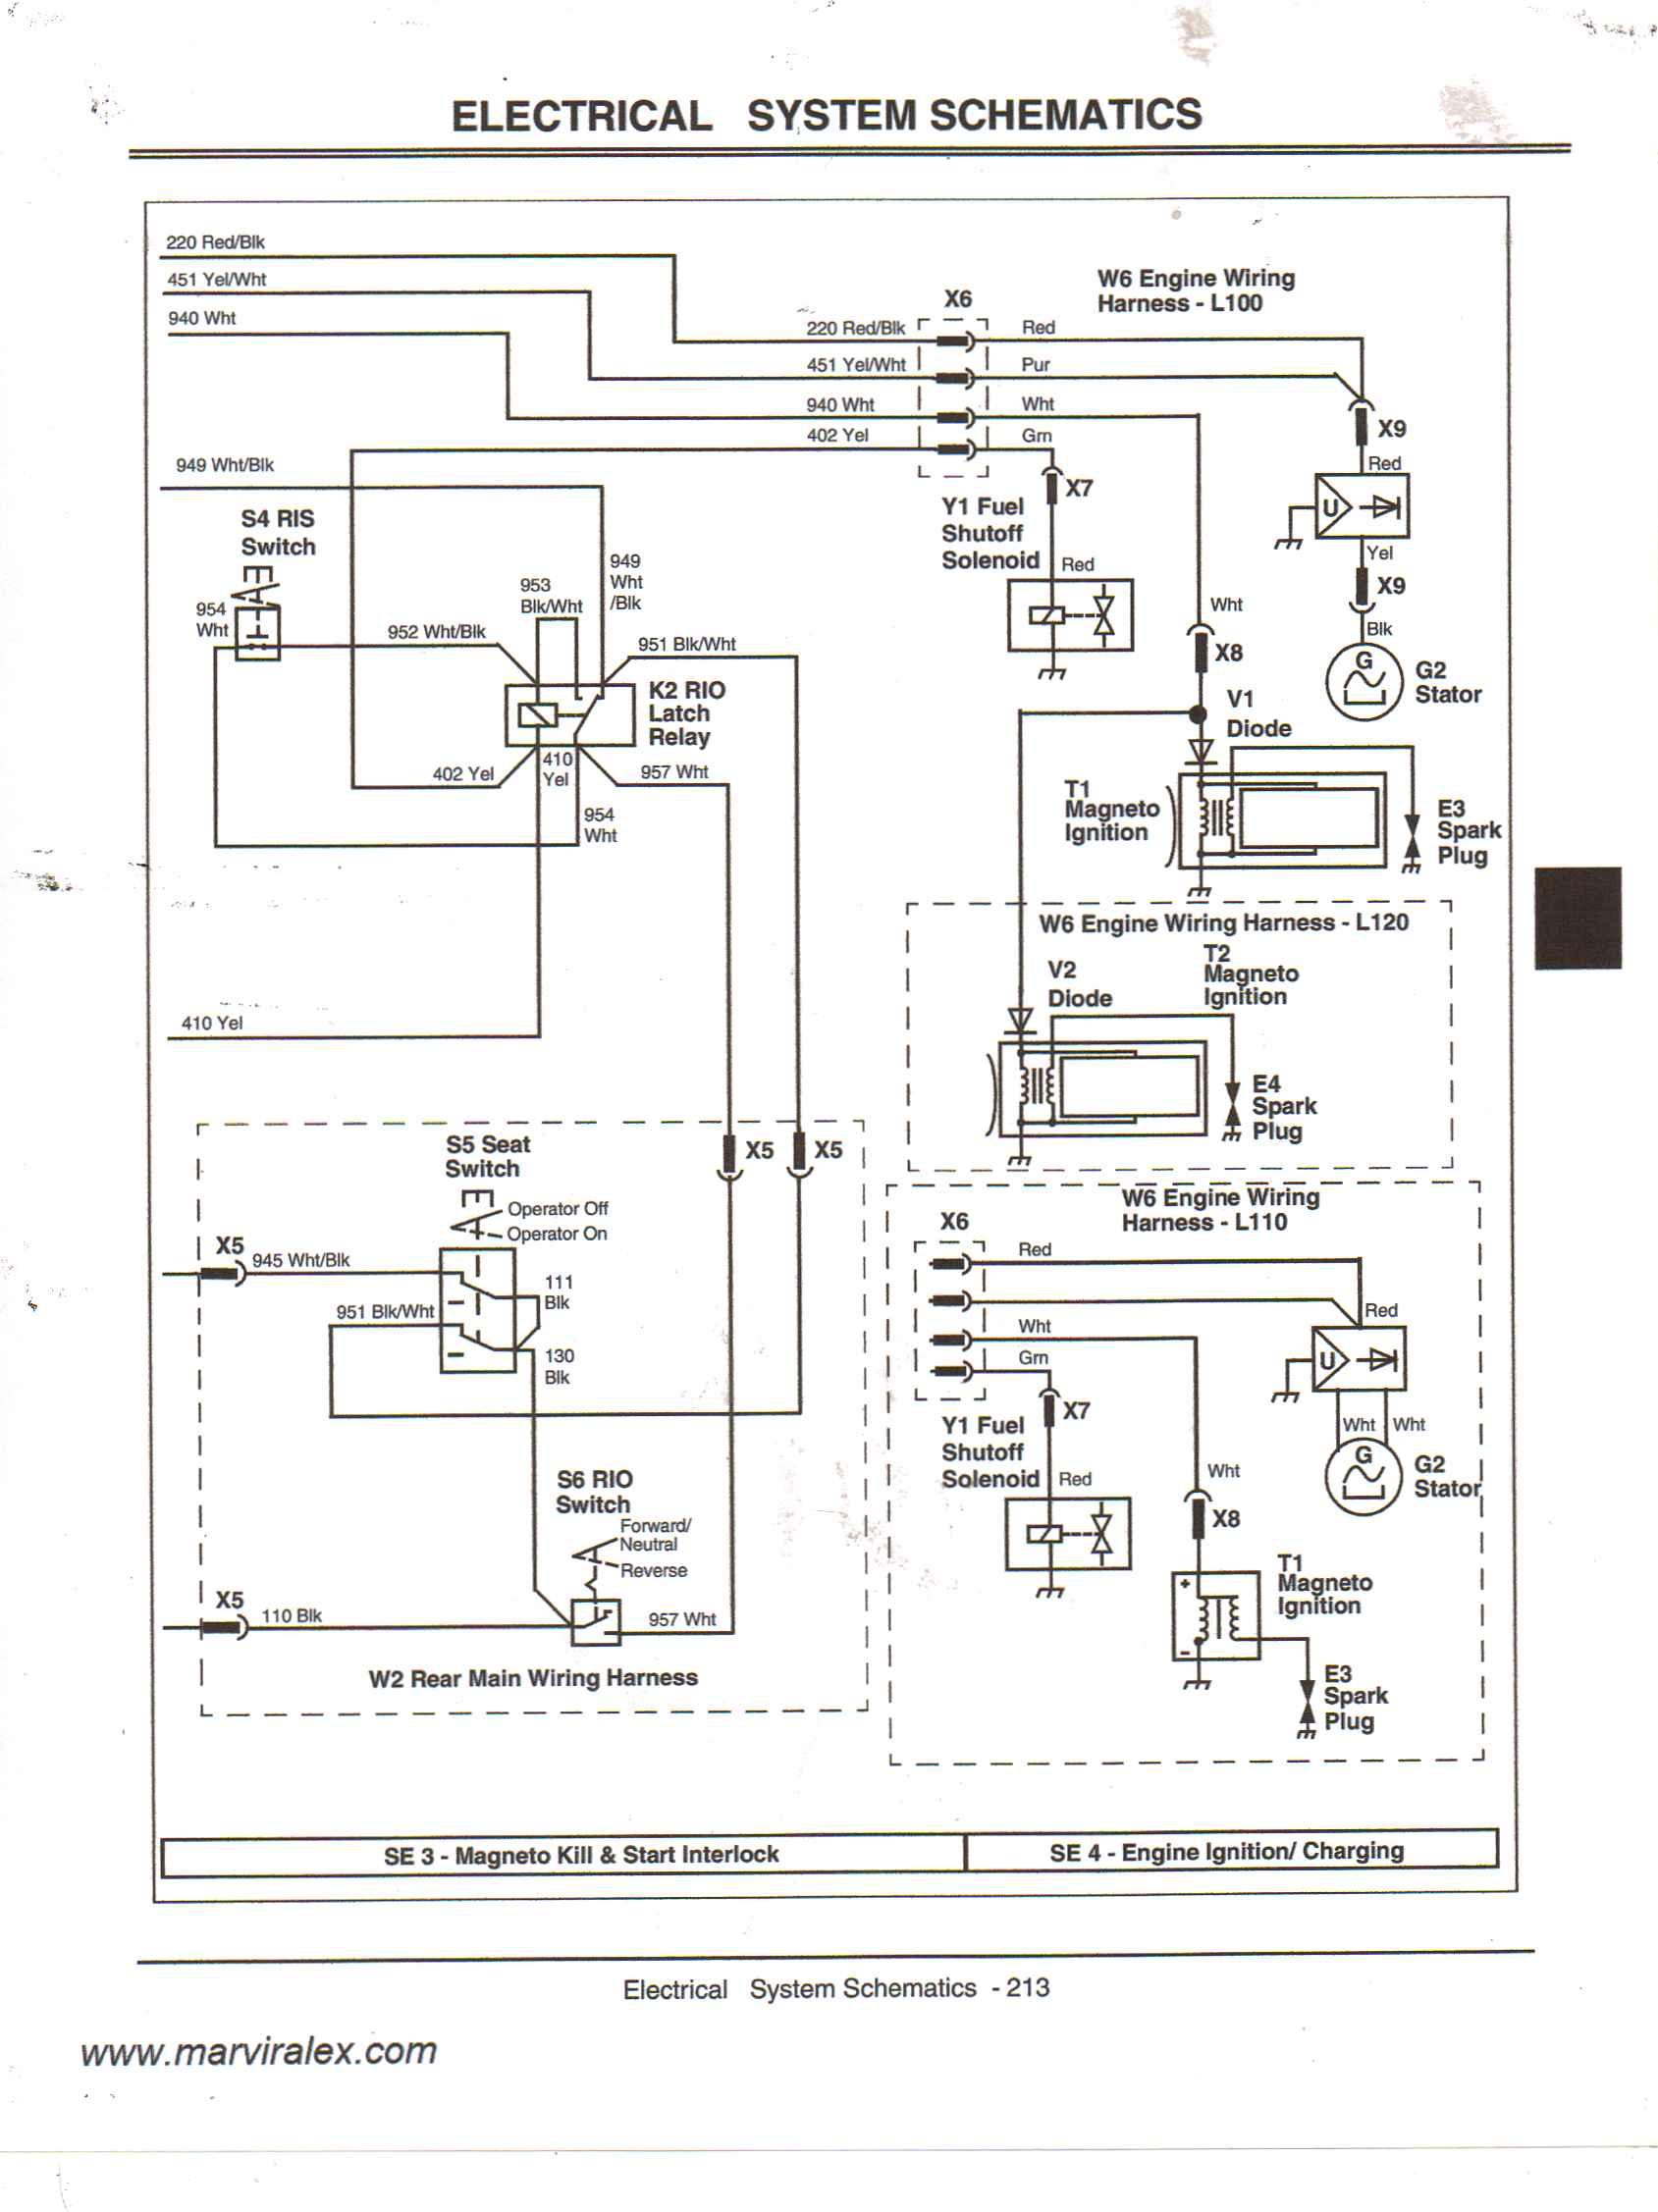 NK_7903] John Deere Lawn Tractor Wiring Diagram Moreover John Deere 212 Wiring  Schematic WiringOliti Anth Xorcede Mohammedshrine Librar Wiring 101